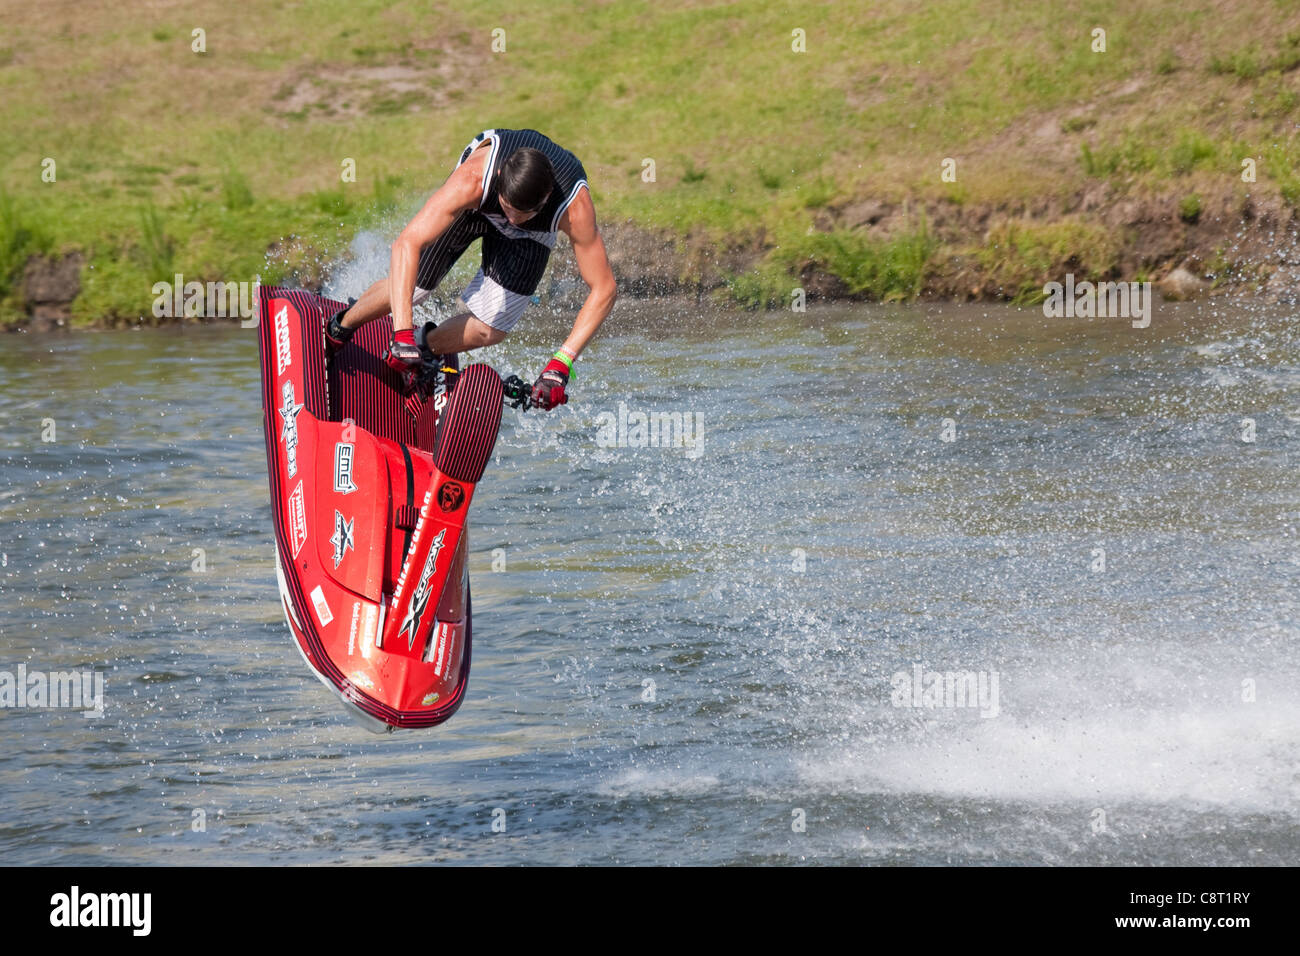 Jet Ski Stunt Demonstration - Stock Image